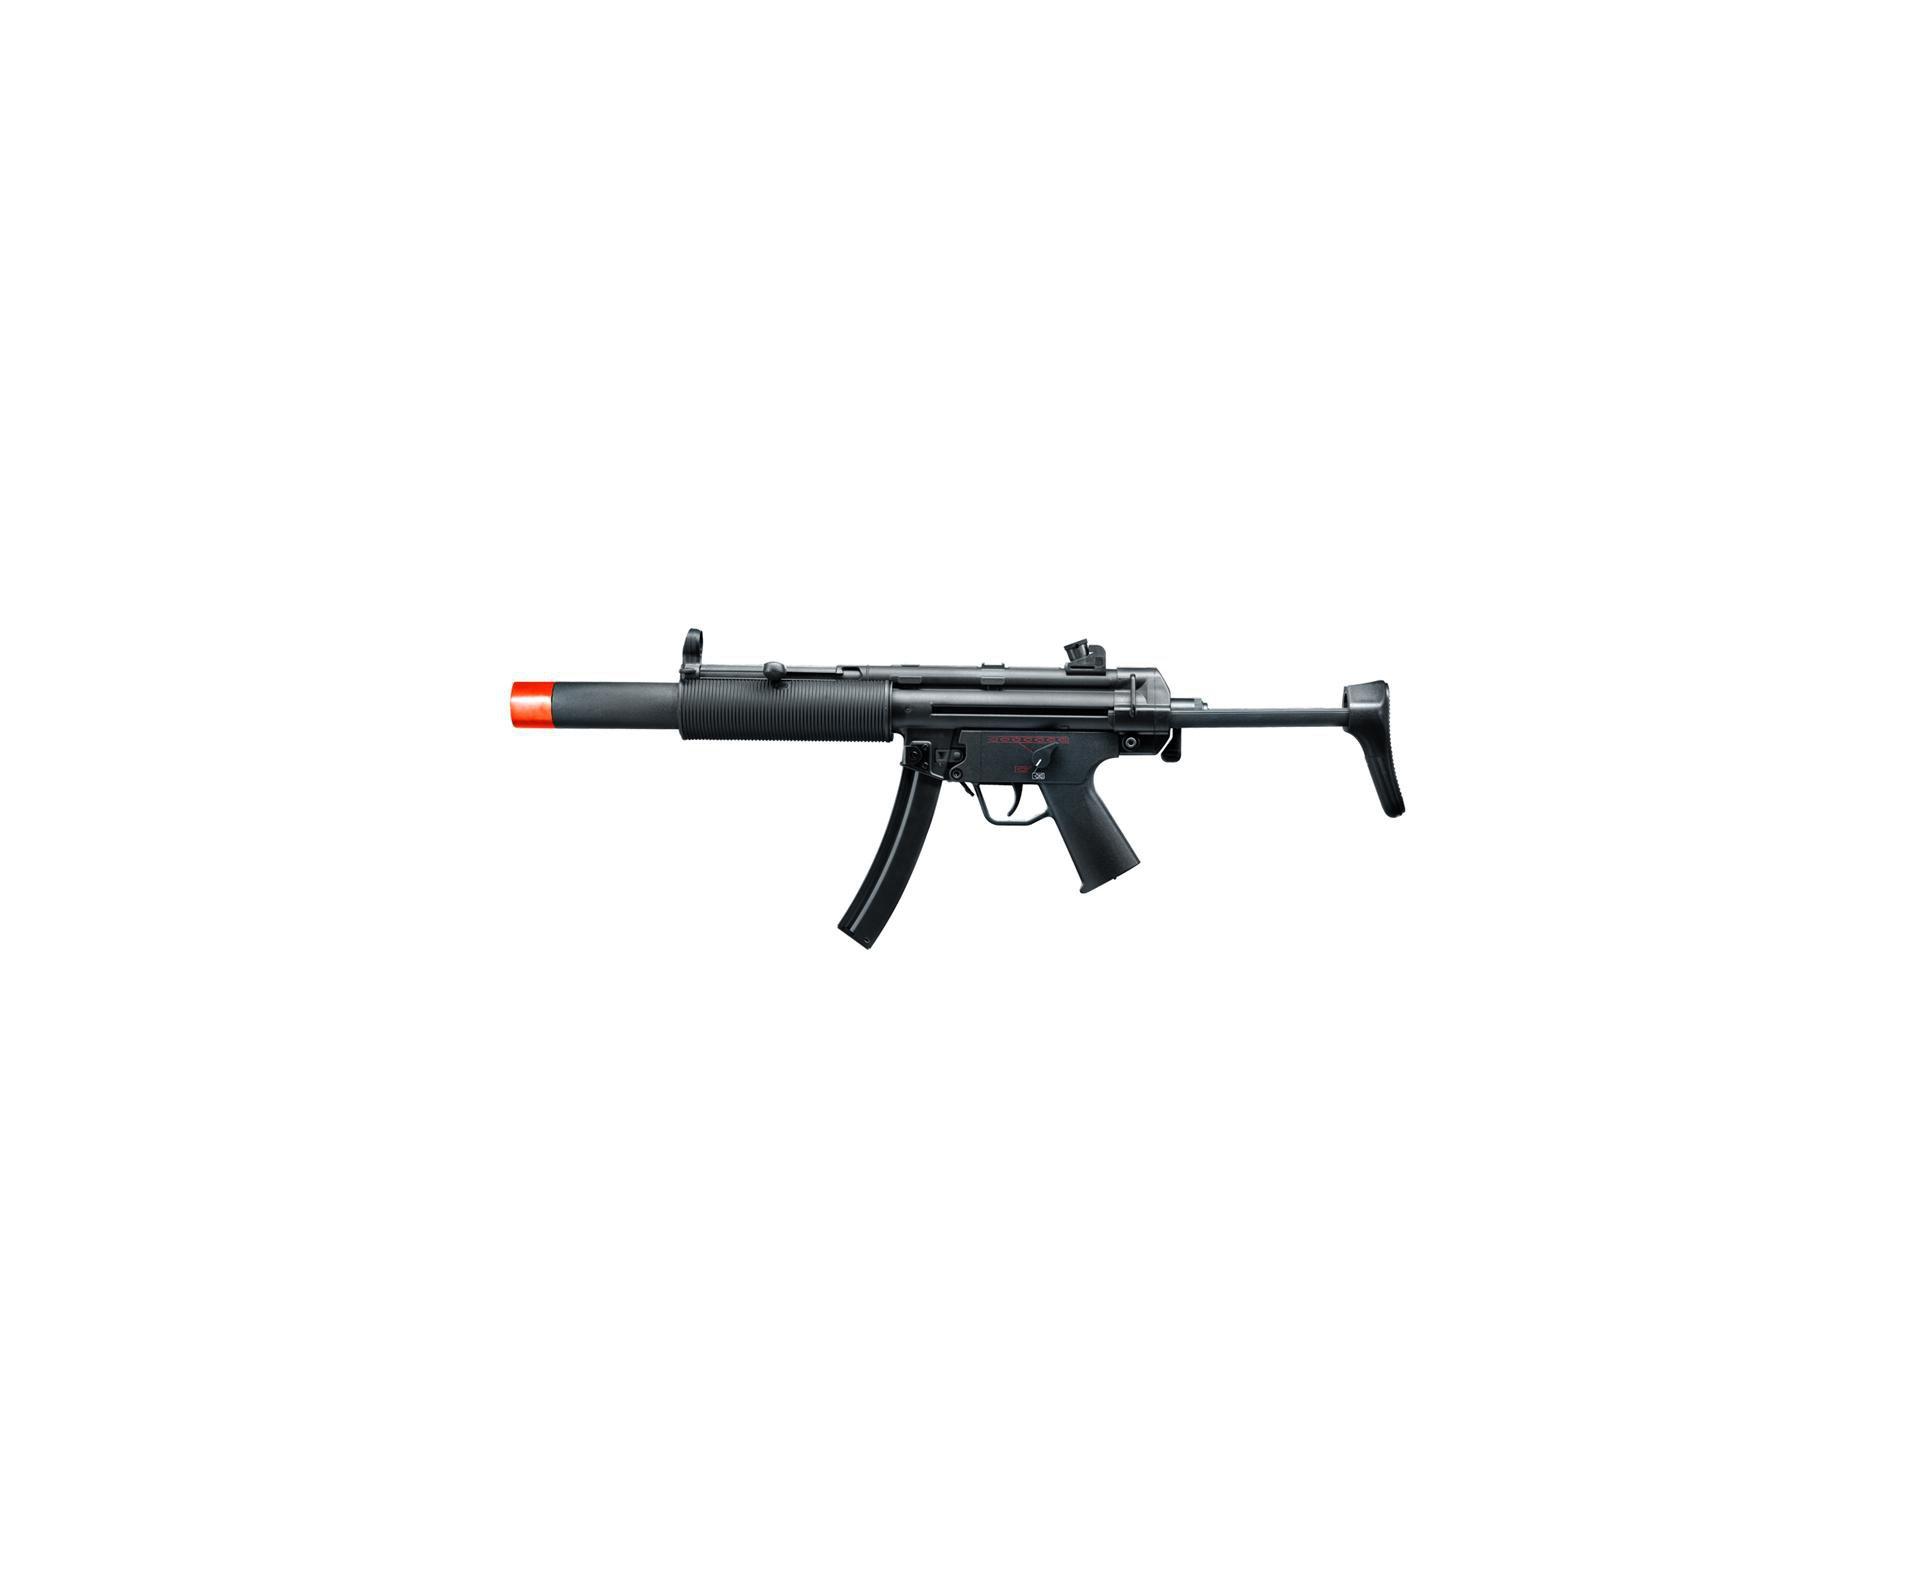 Rifle De Airsoft H&k Mp5 Sd6 Semi/metal Cal 6mm - Umarex